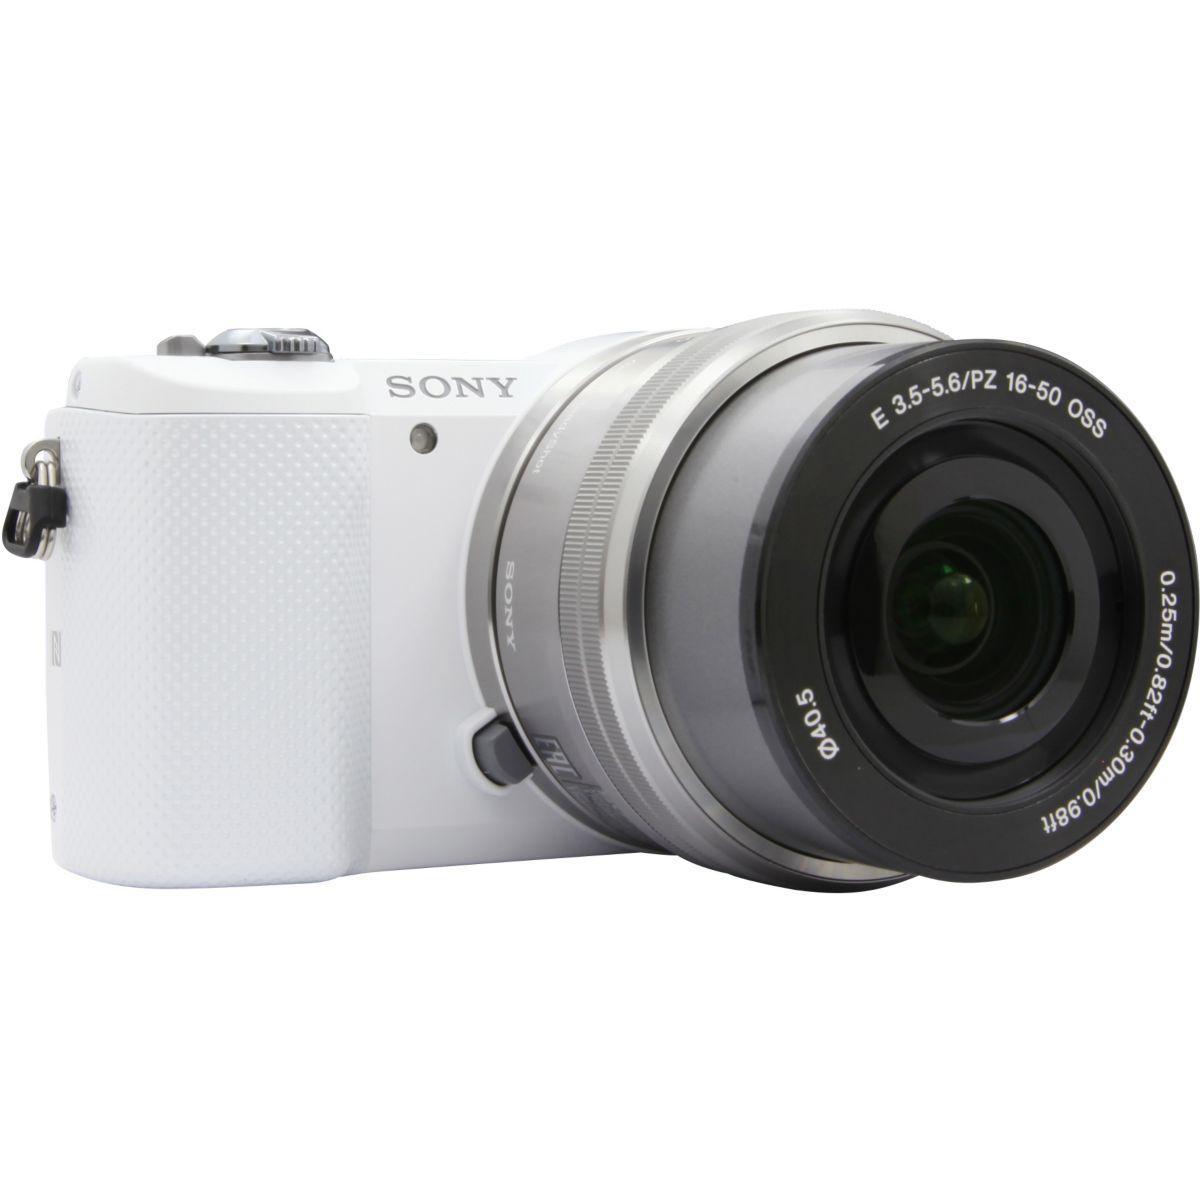 Appareil photo hybride sony a5000 blanc + 16-50mm argent (photo)